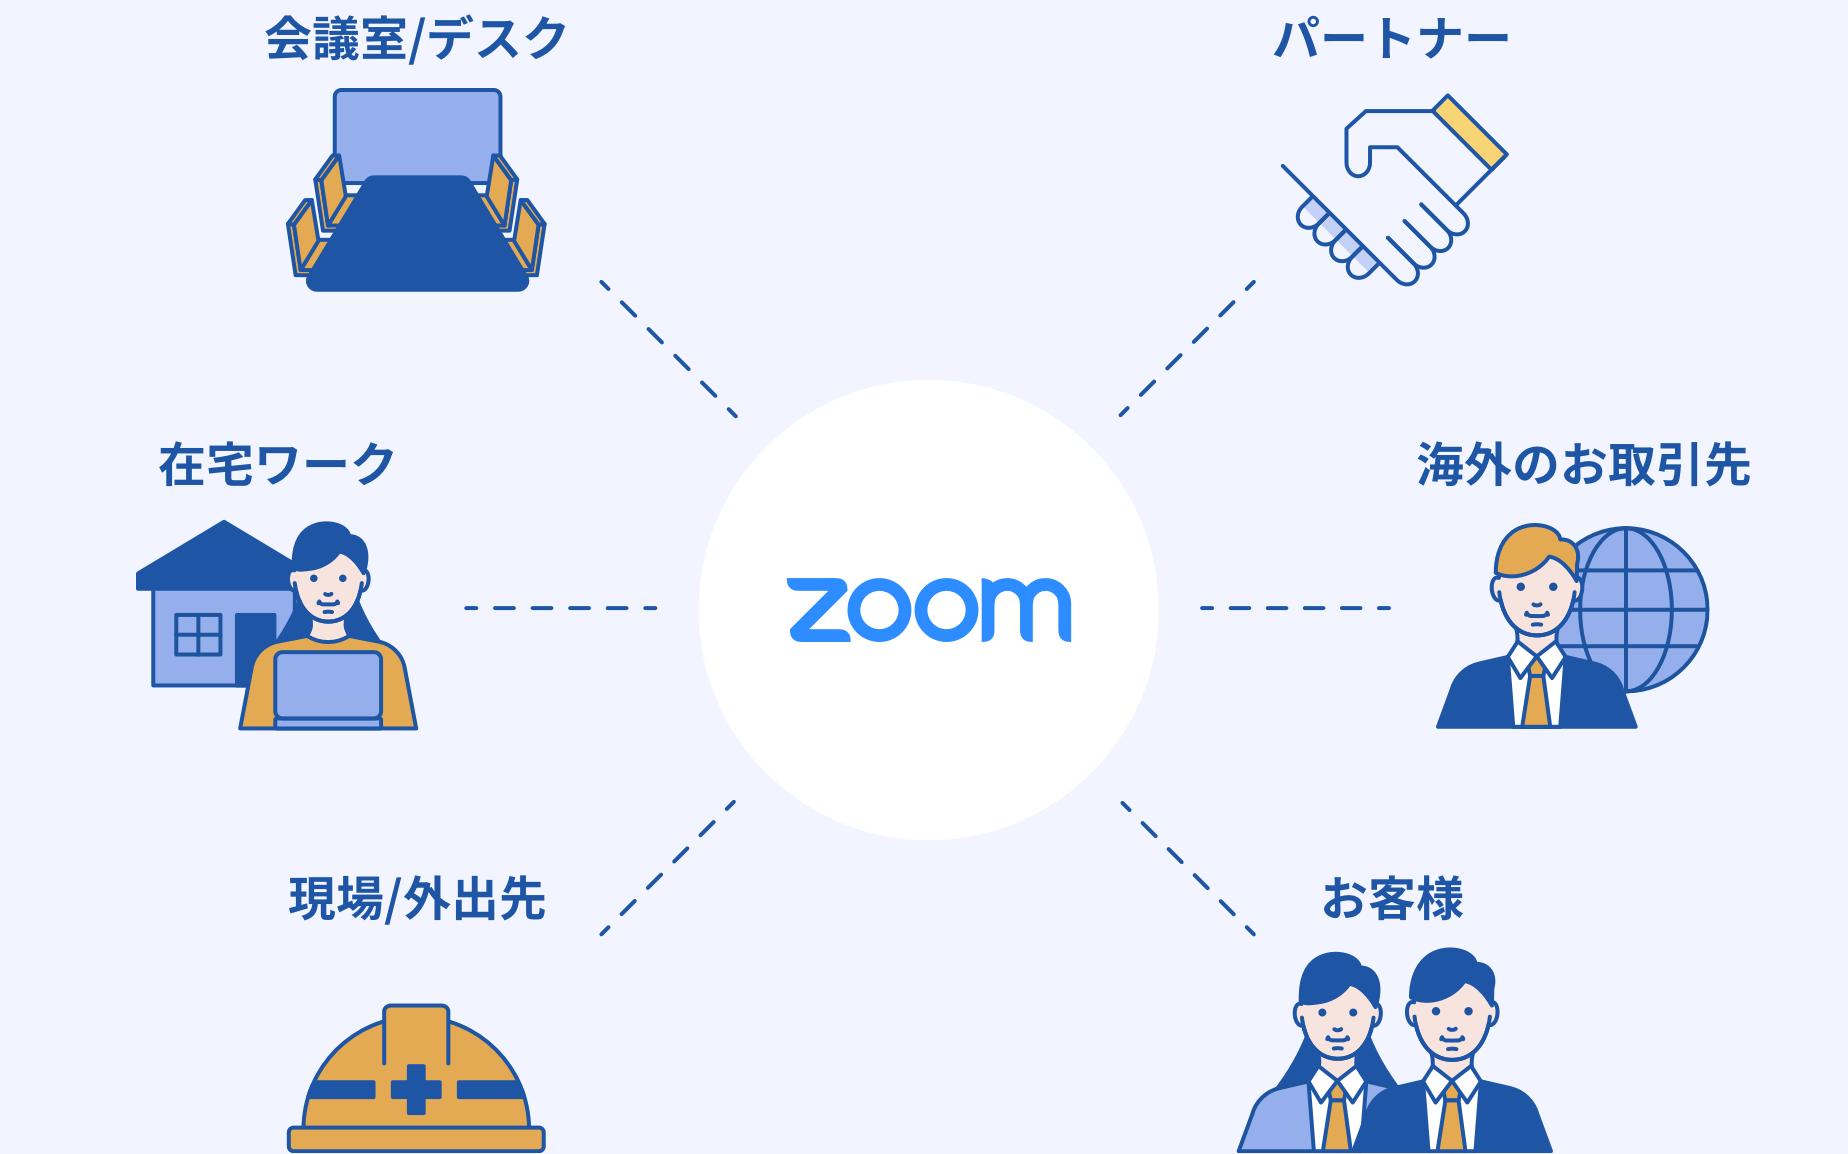 Zoom活用による「テレワークの実現」で企業・組織の生産性が向上!